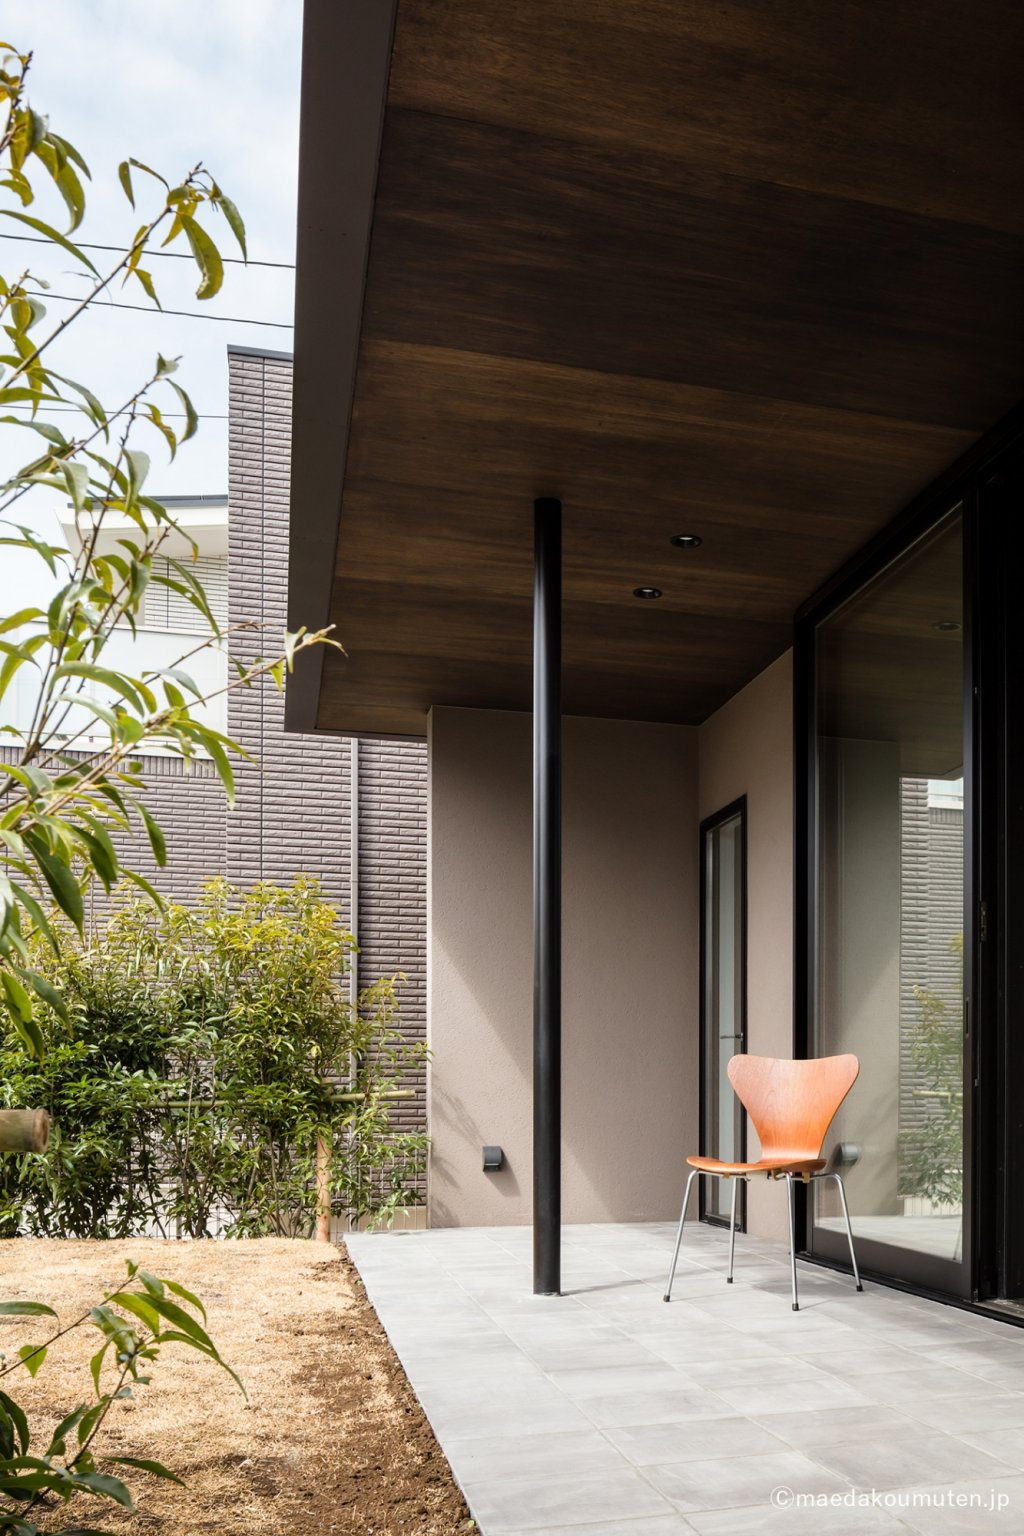 神奈川、工務店、注文住宅、デザイン住宅、建築家、大島の家、06